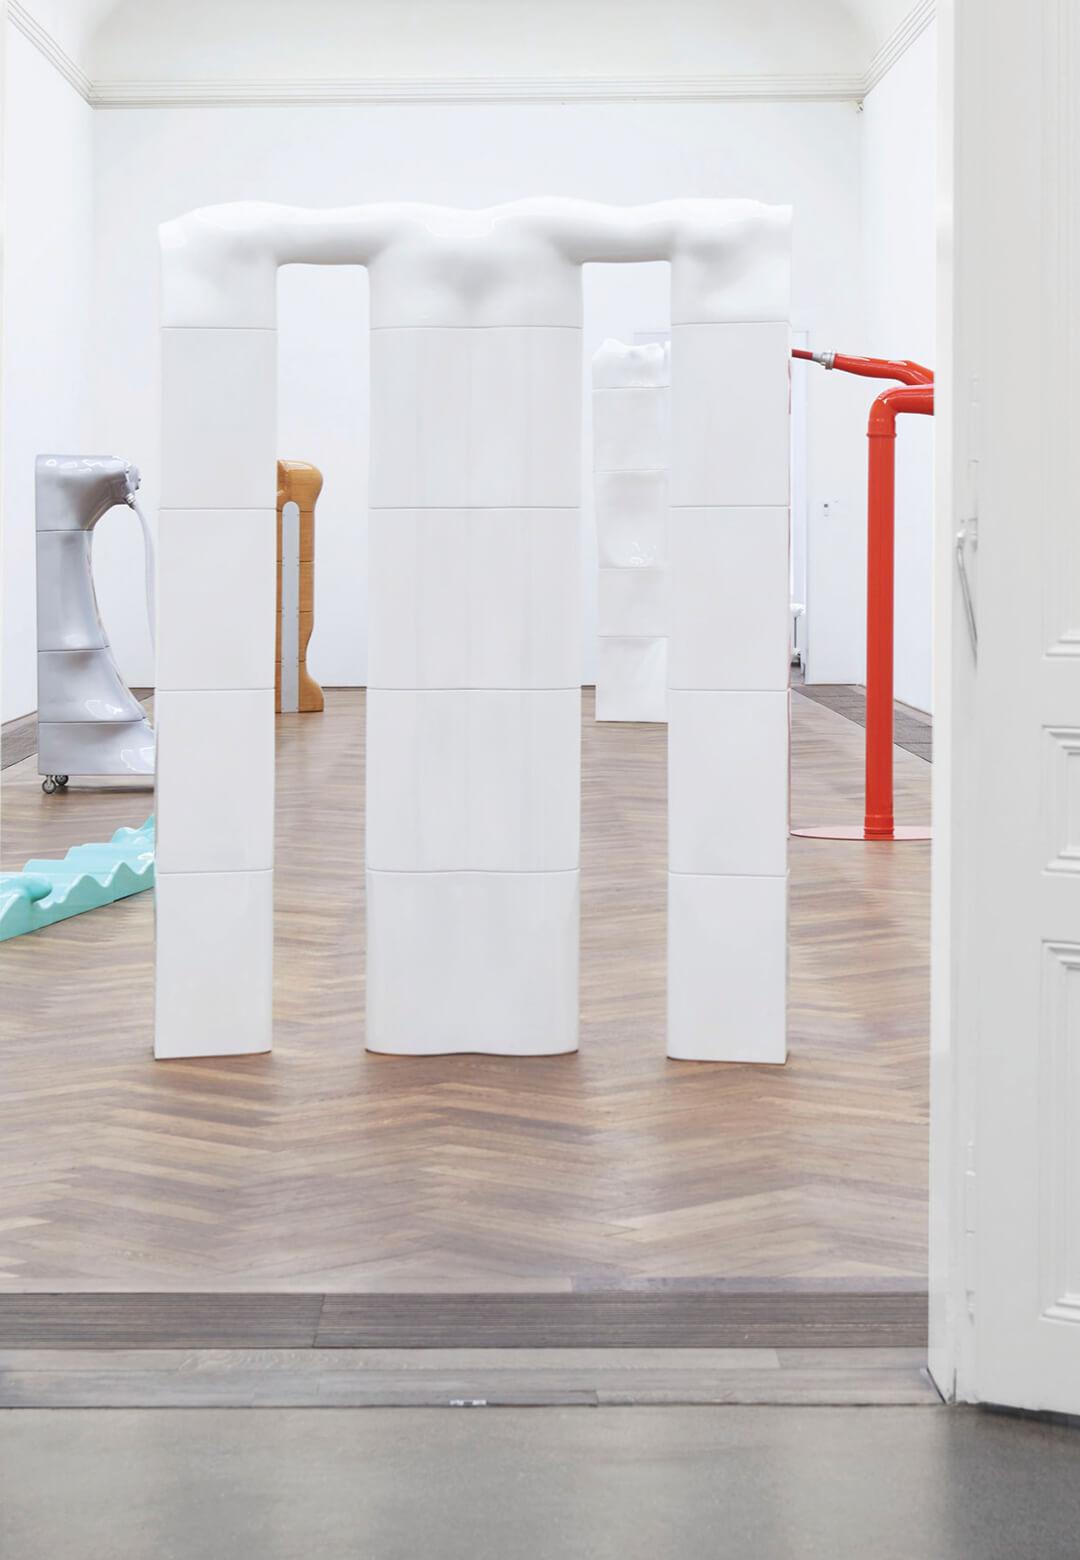 Die Nichtschoenen Works 1967–1974 by Joachim Bandau at Kunsthalle Basel | Joachim Bandau | STIRworld